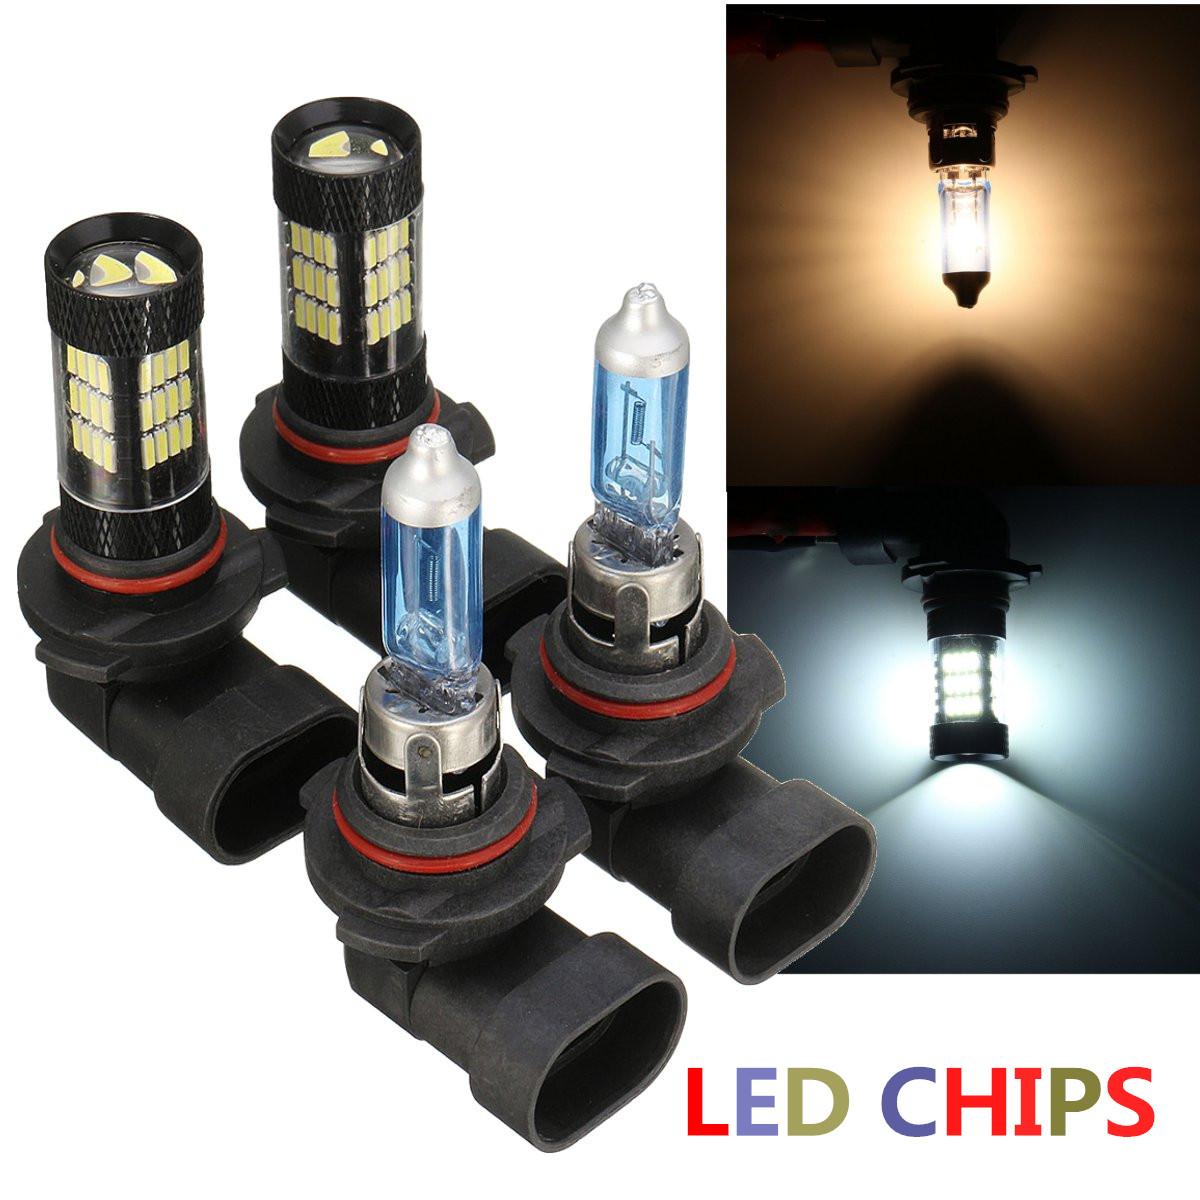 9006 HB4 Samsung LED Chip 30 SMD White 6000K Headlight 2x Light Bulb Low Beam